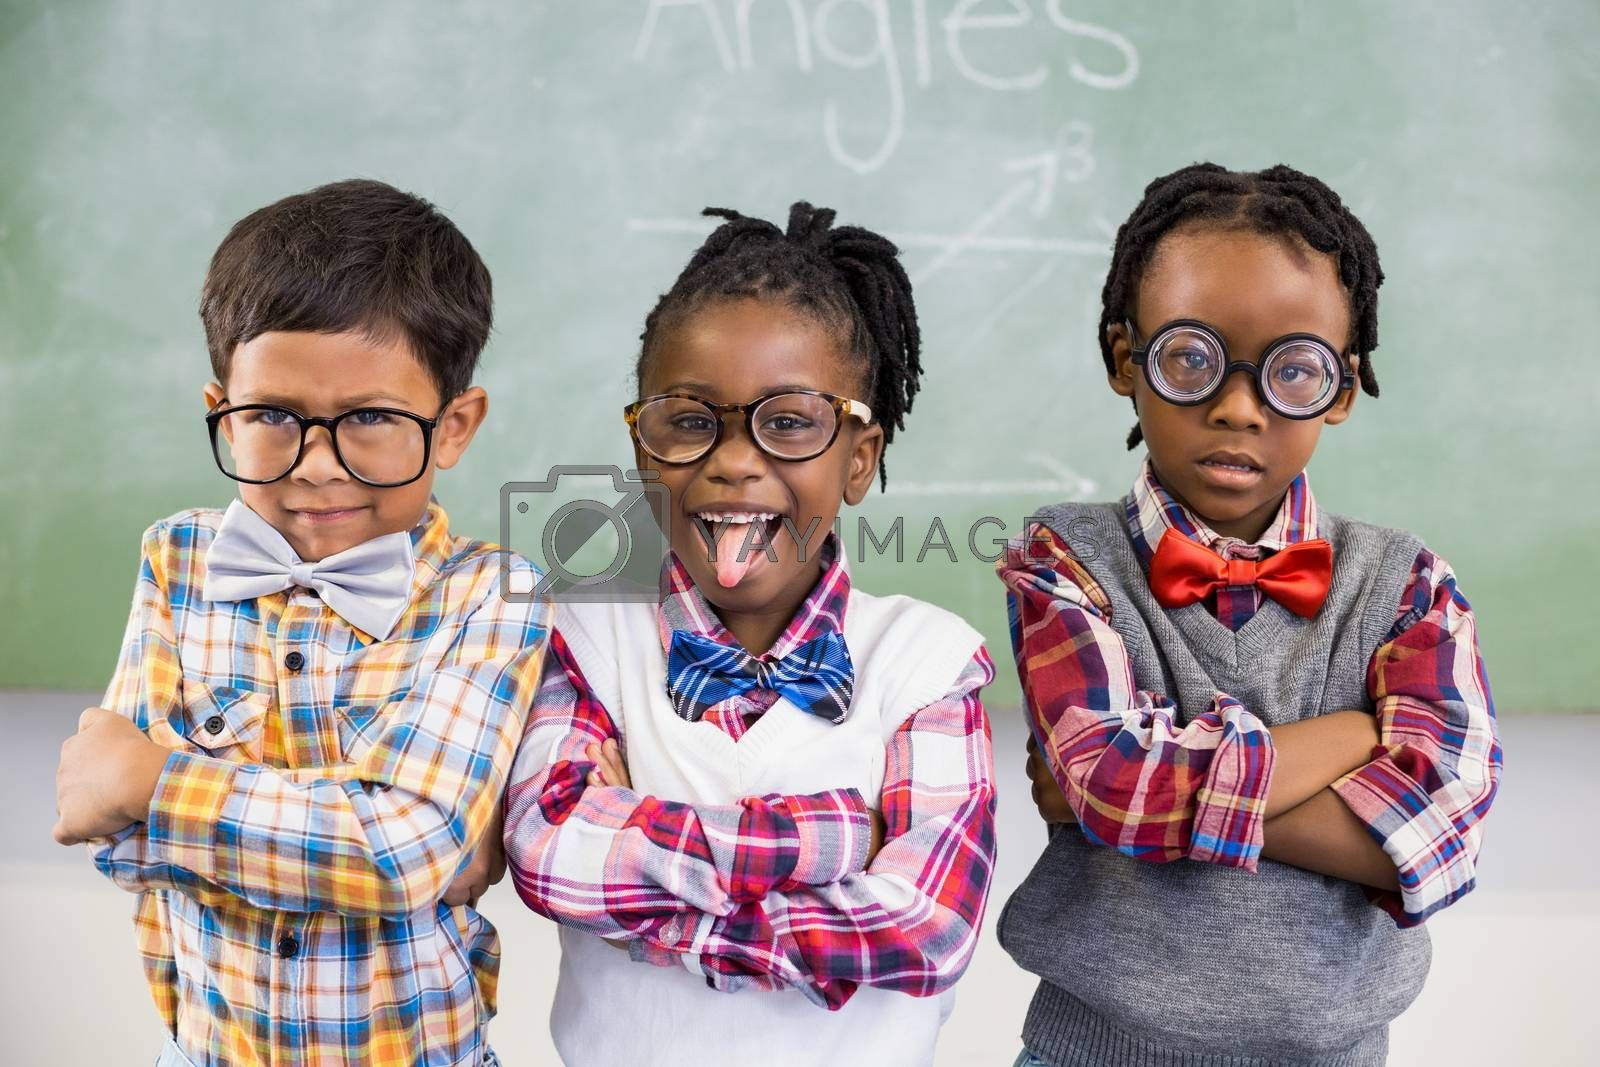 Portrait of three school kids standing against chalkboard in classroom